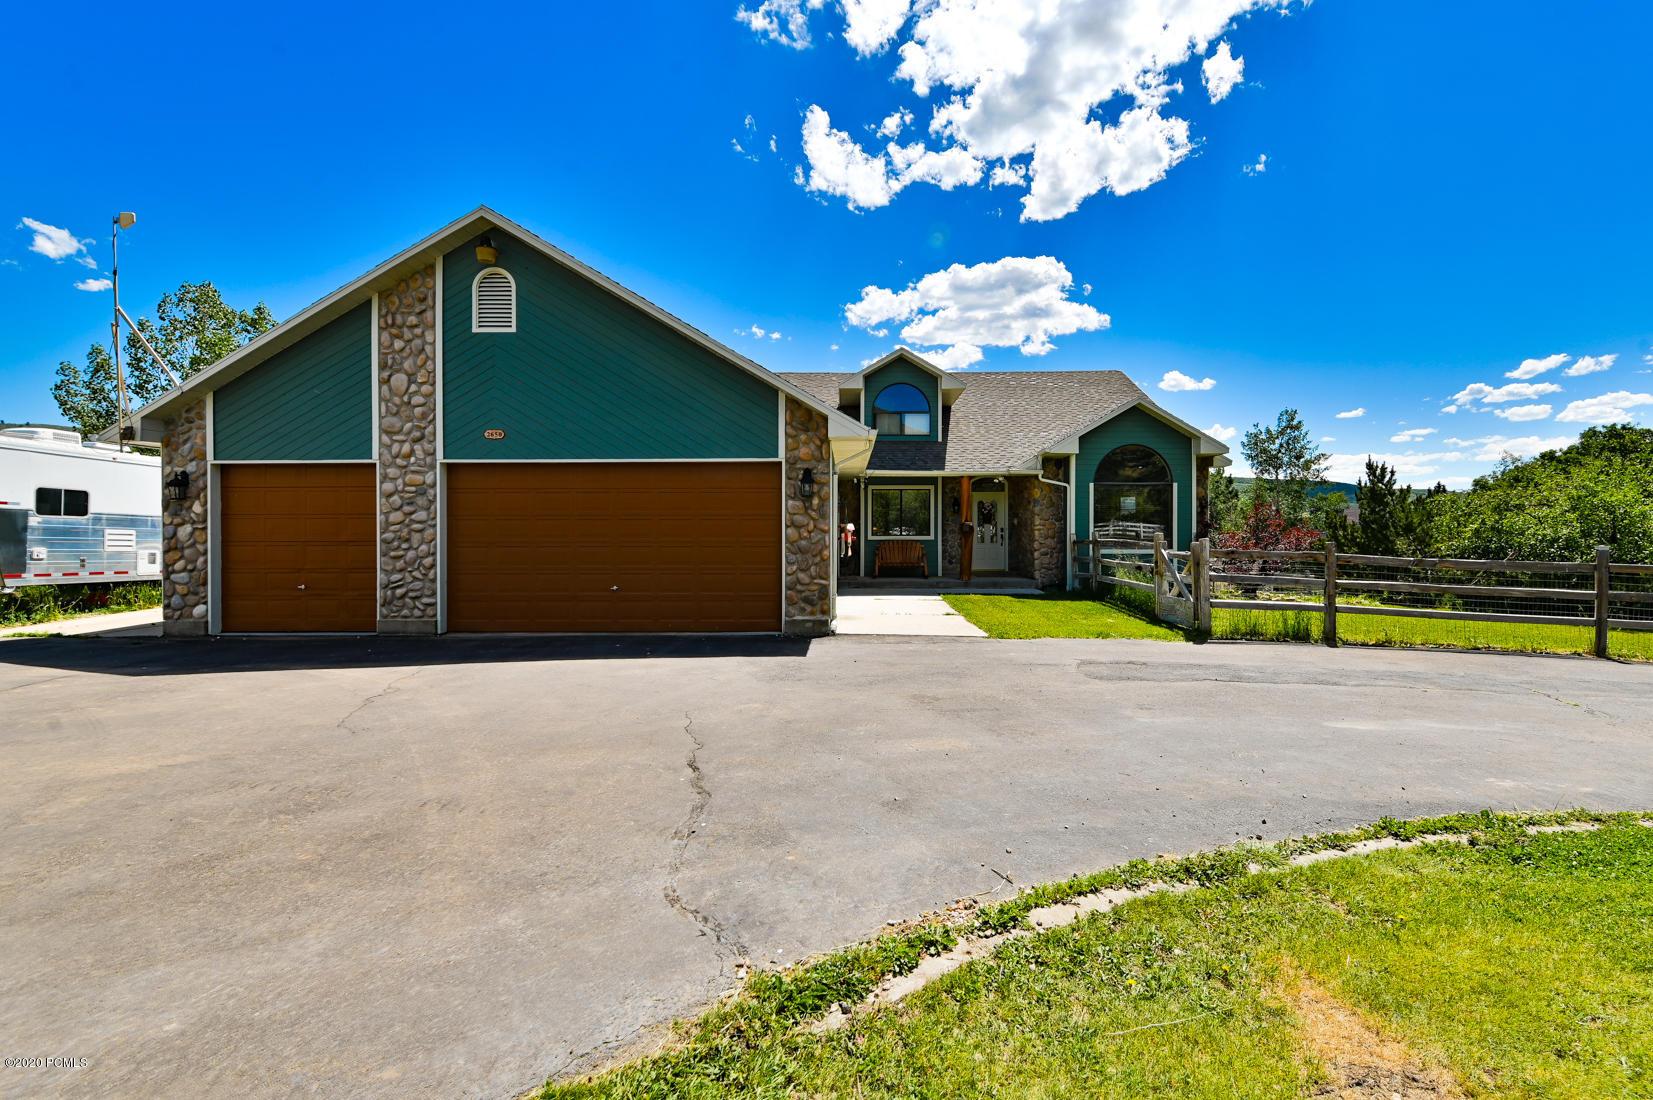 2650 Woodland Way, Woodland, Utah 84036, 7 Bedrooms Bedrooms, ,4 BathroomsBathrooms,Single Family,For Sale,Woodland,20190109112430415765000000